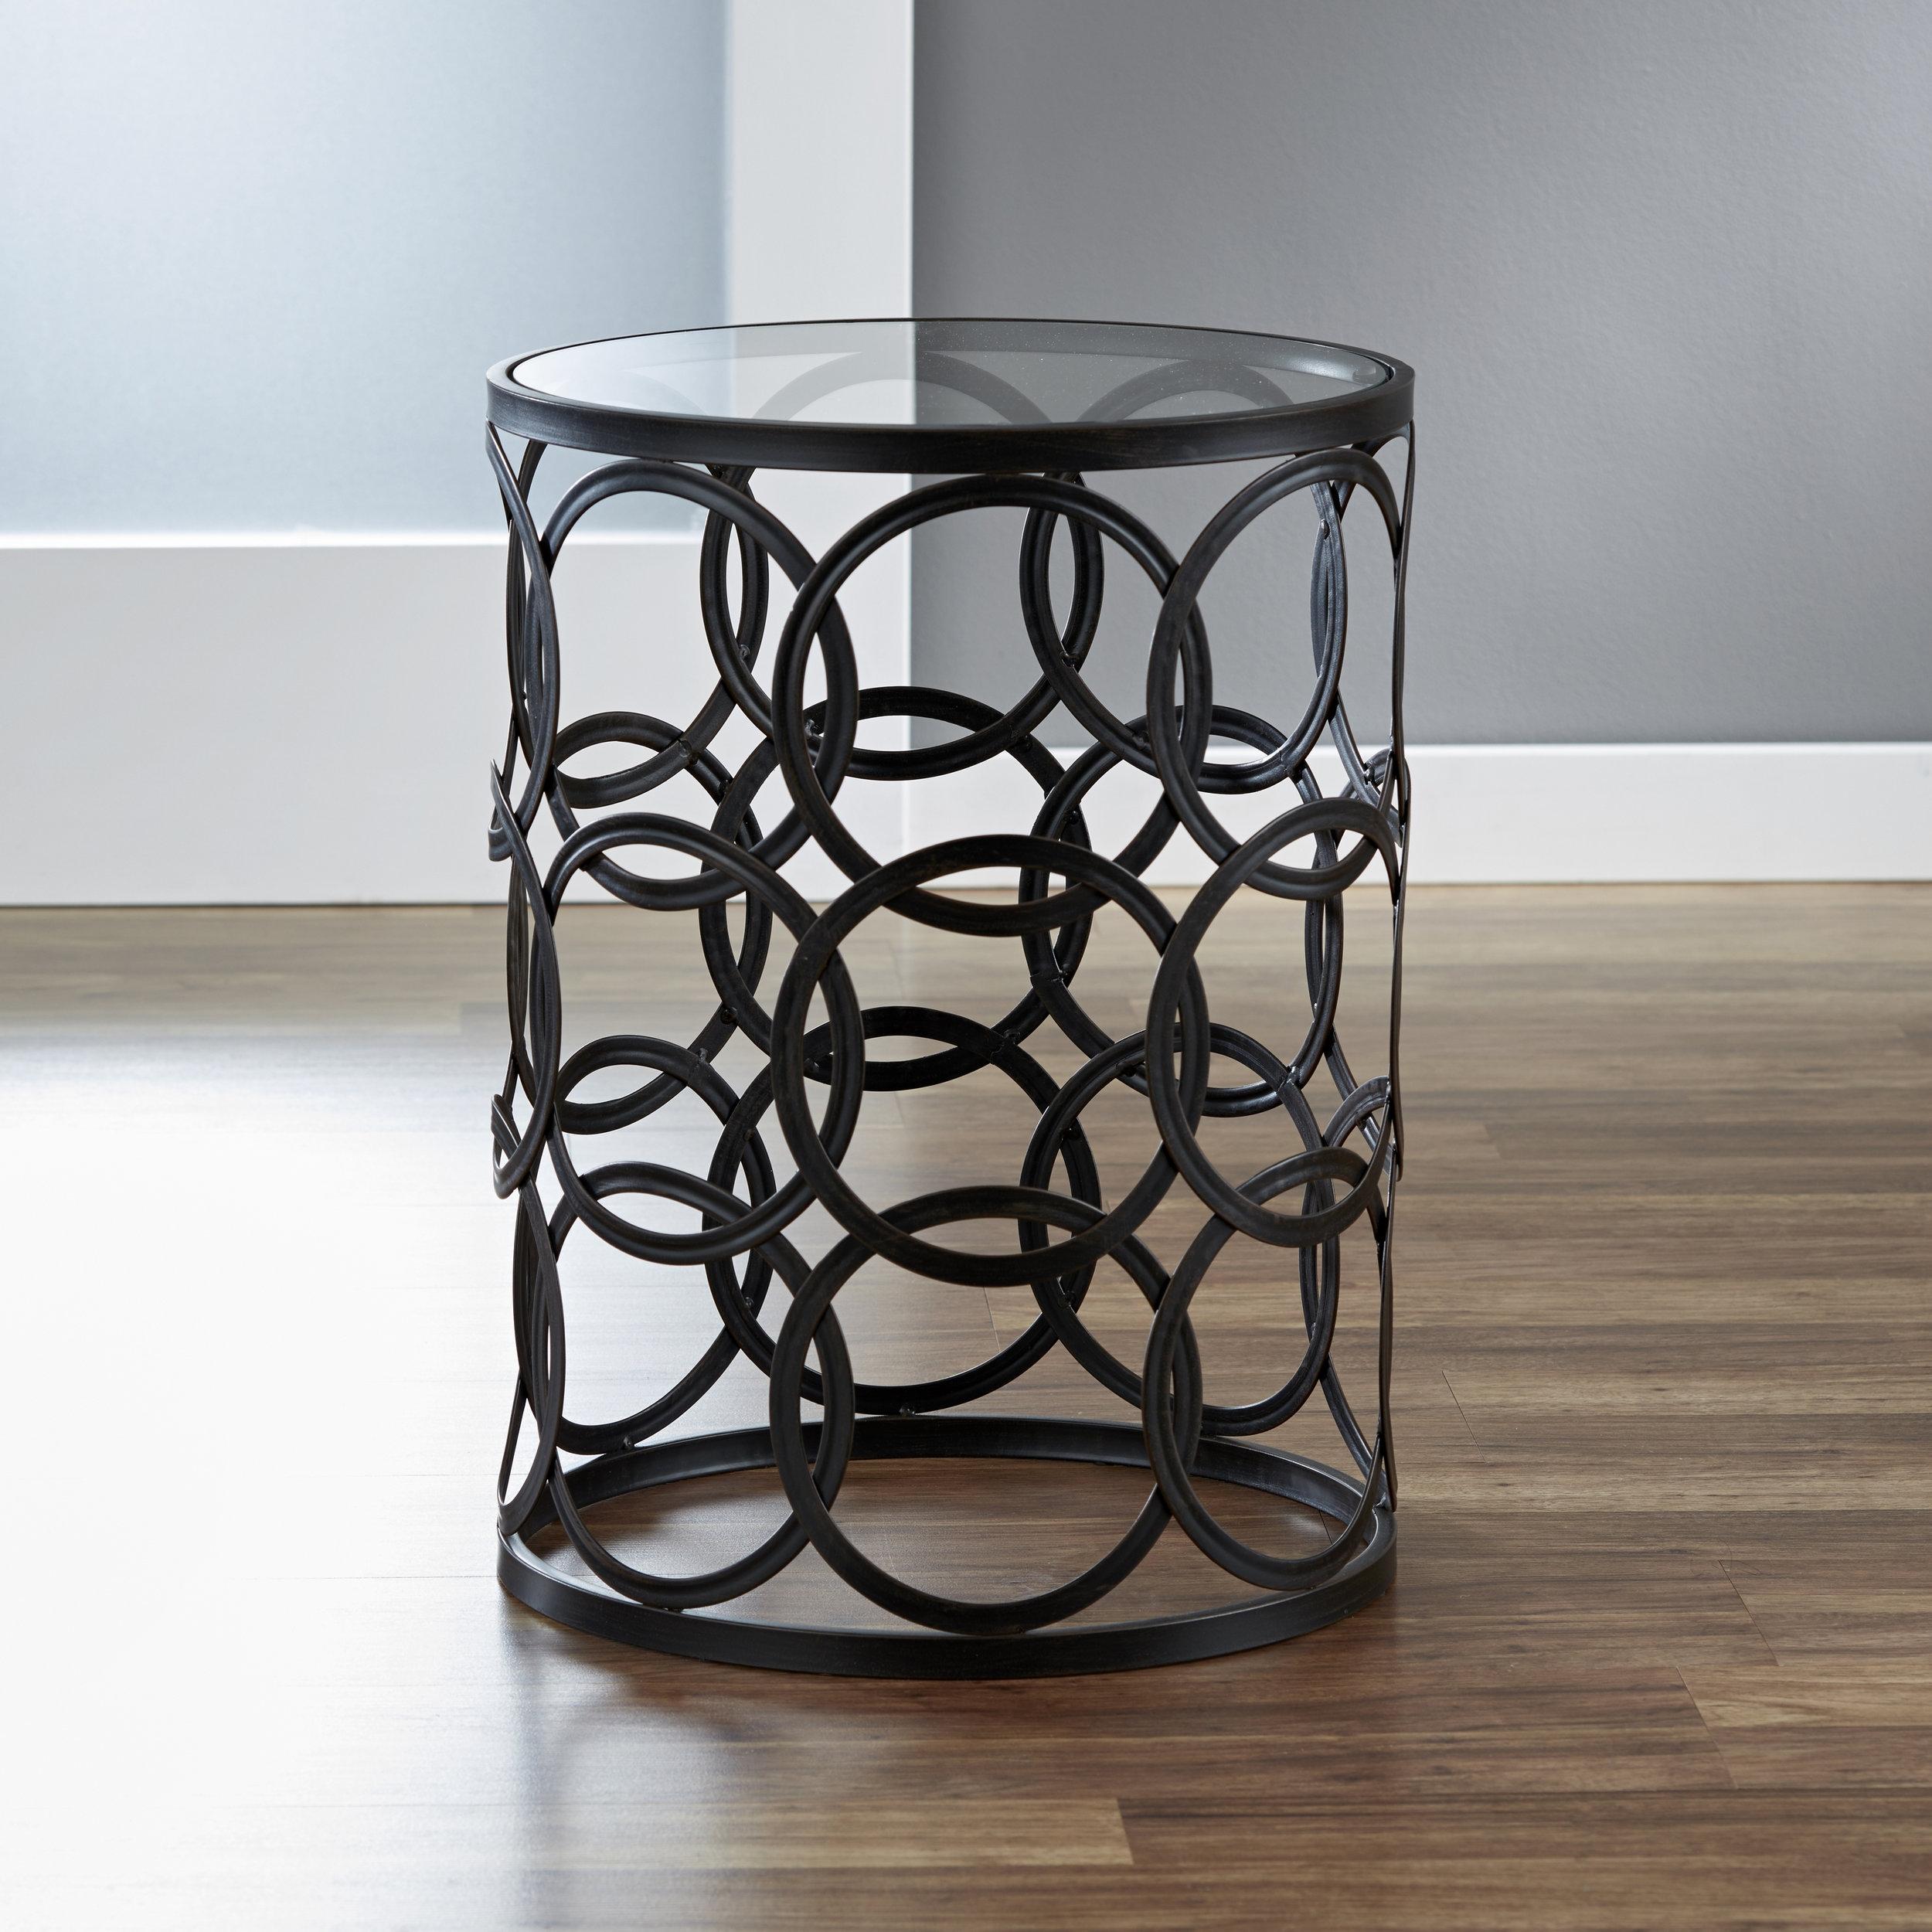 Interlocking Circles Table